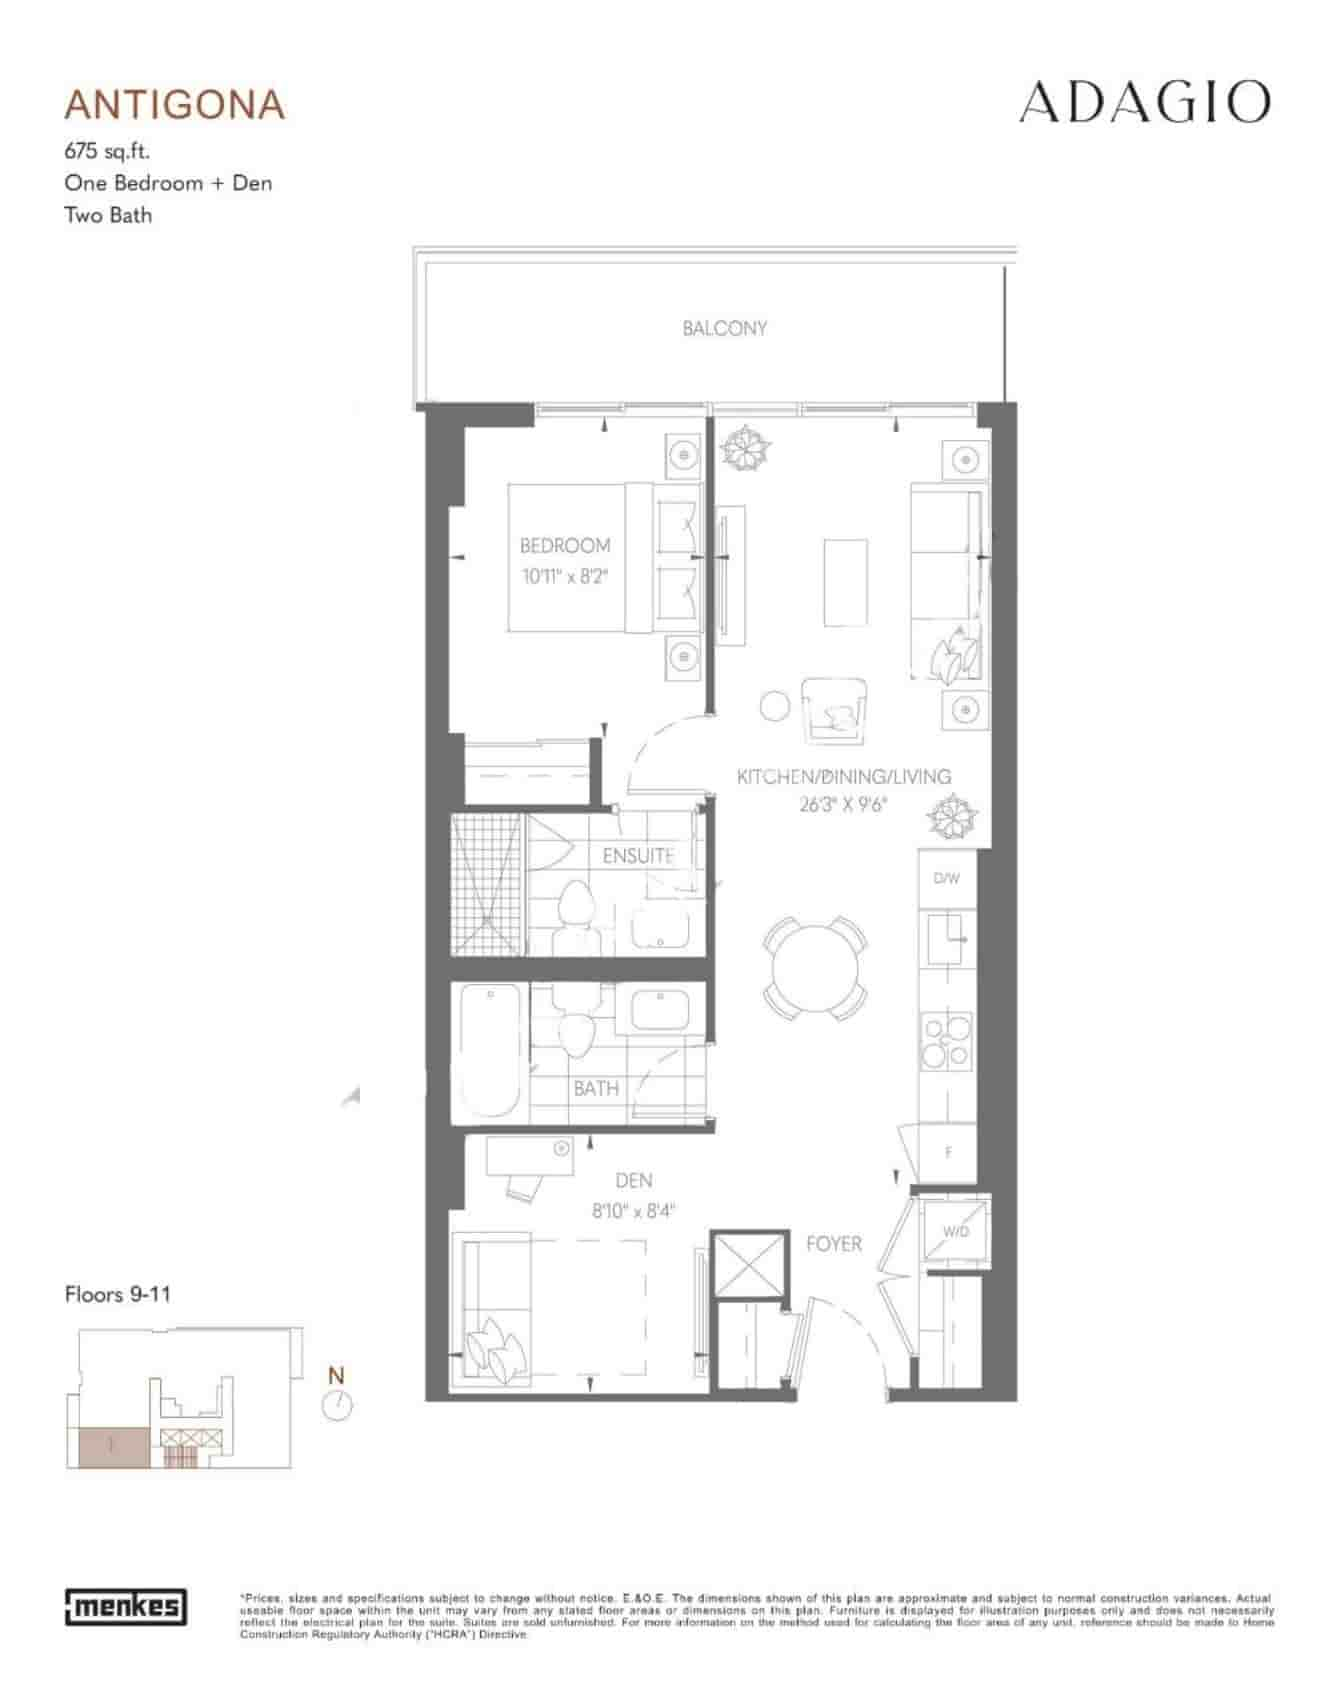 Adagio Condos floor plan Antigona